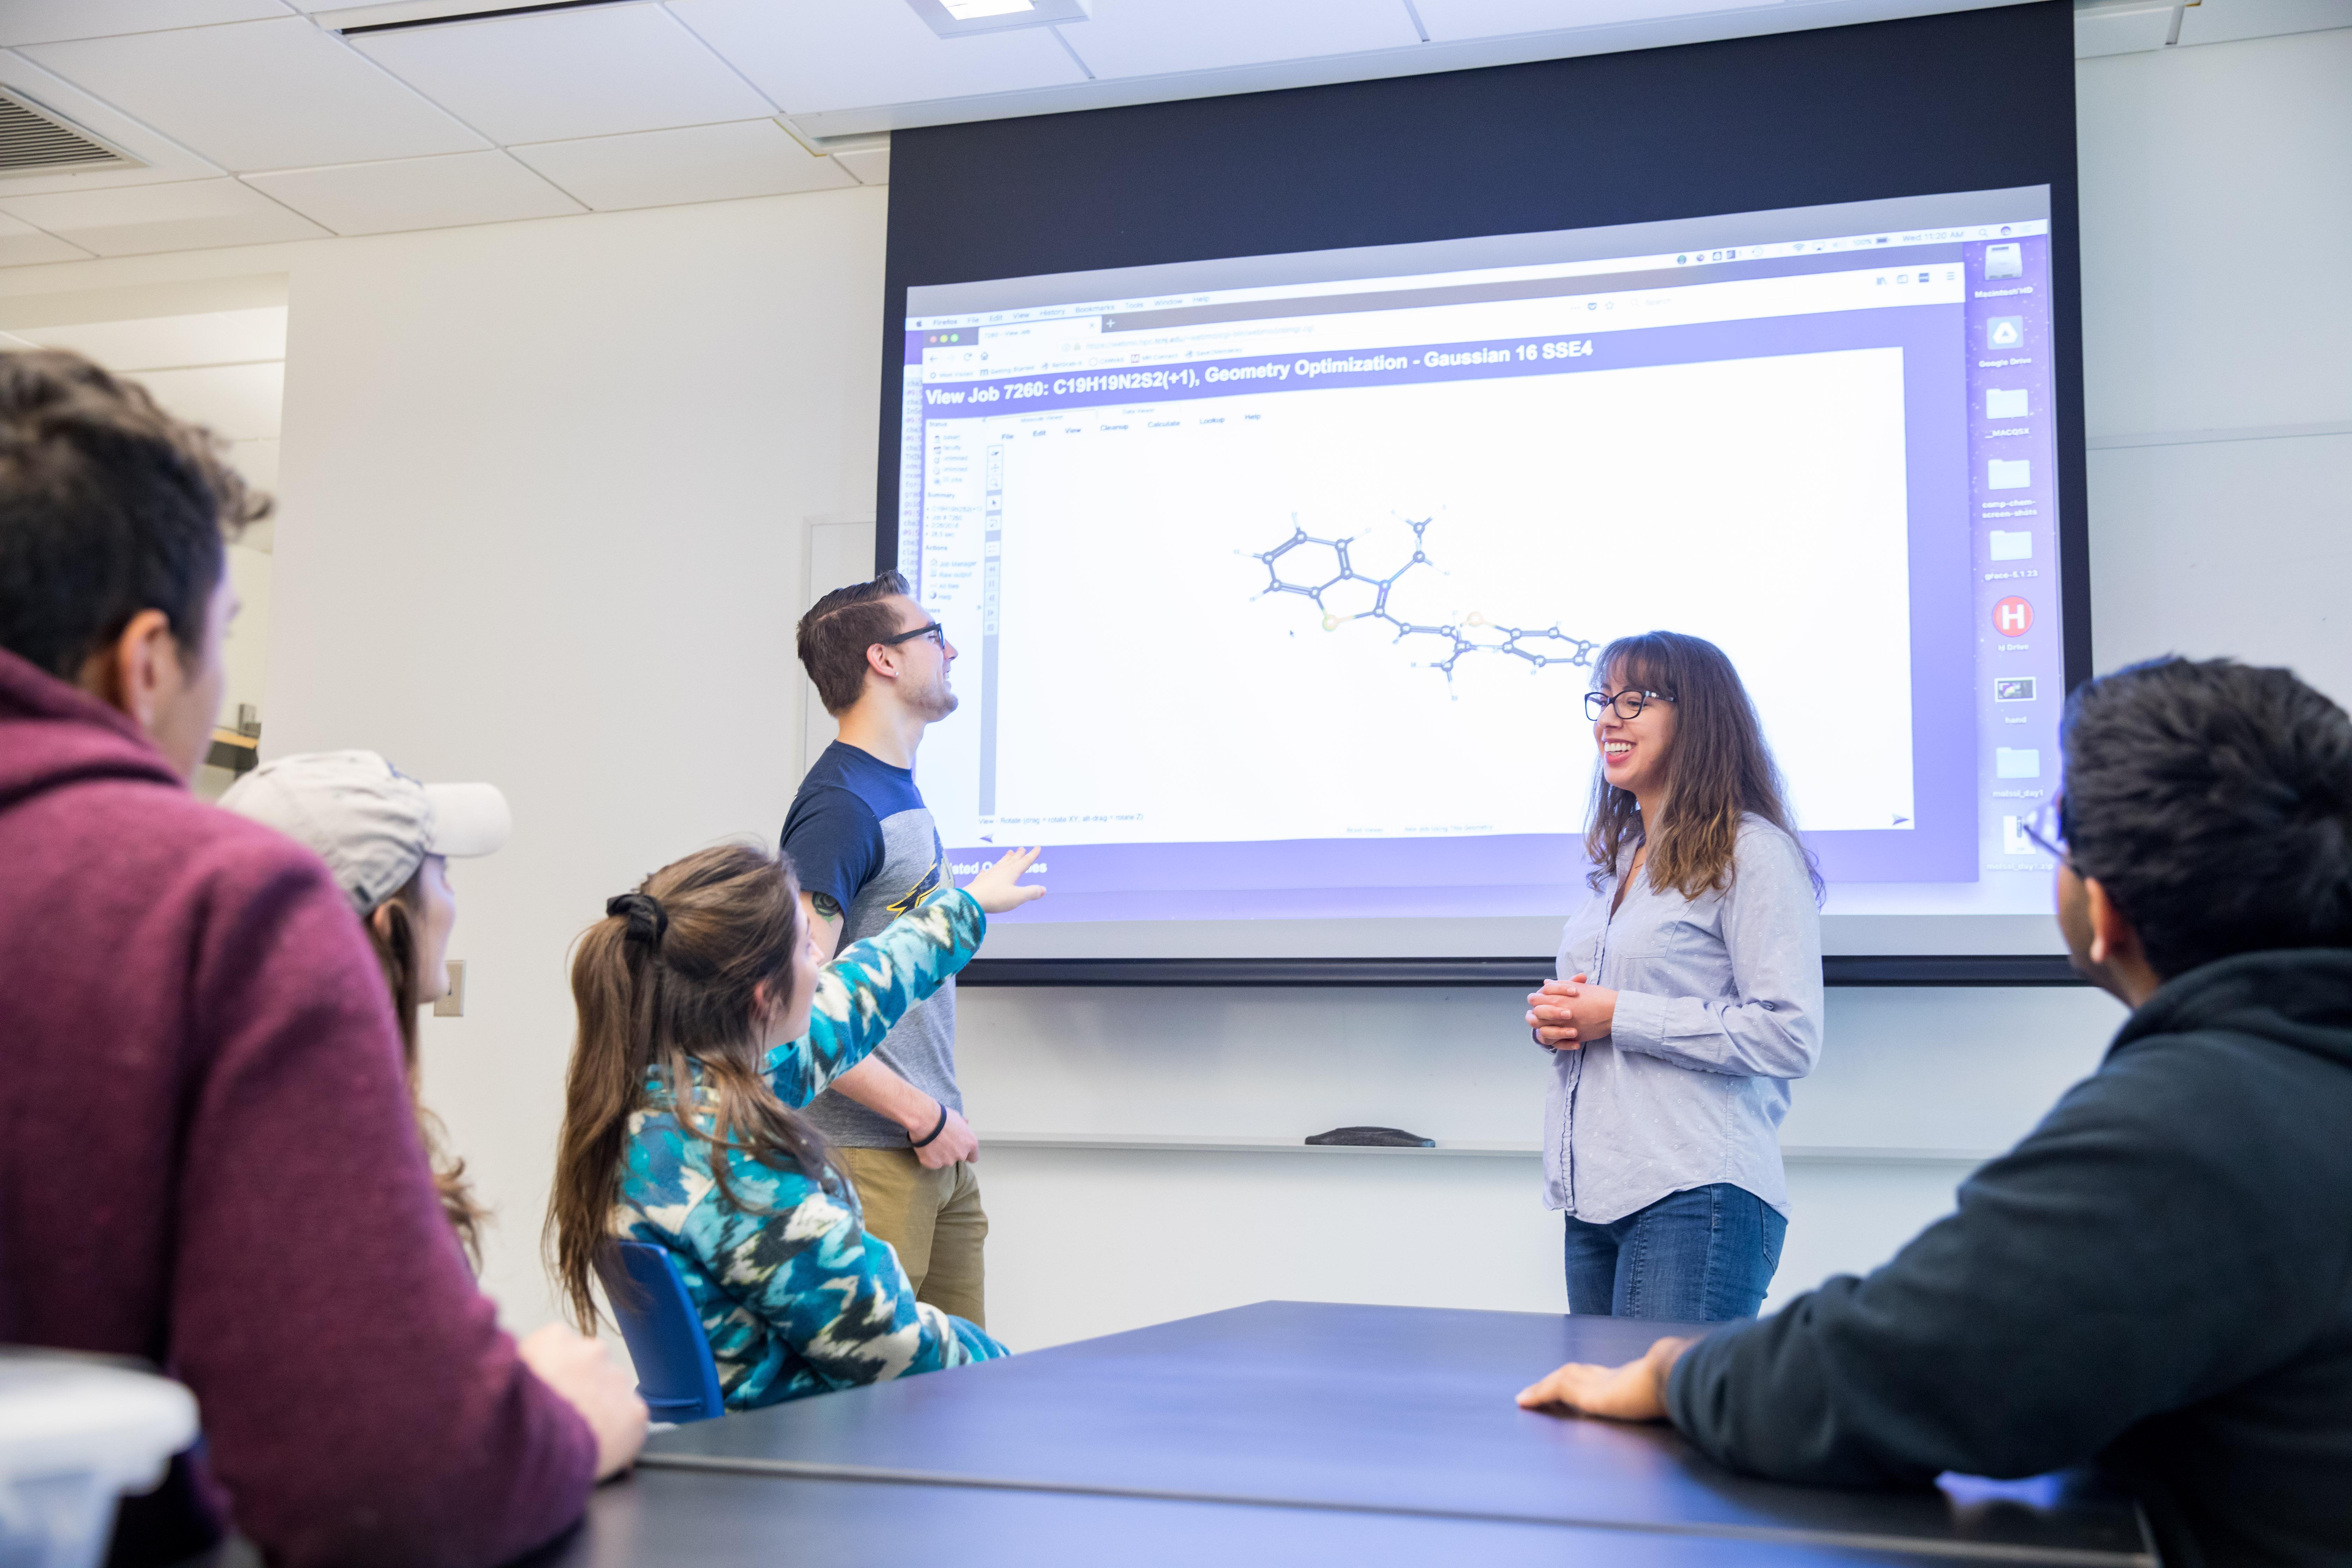 Chemistry Secondary Education Degree Program